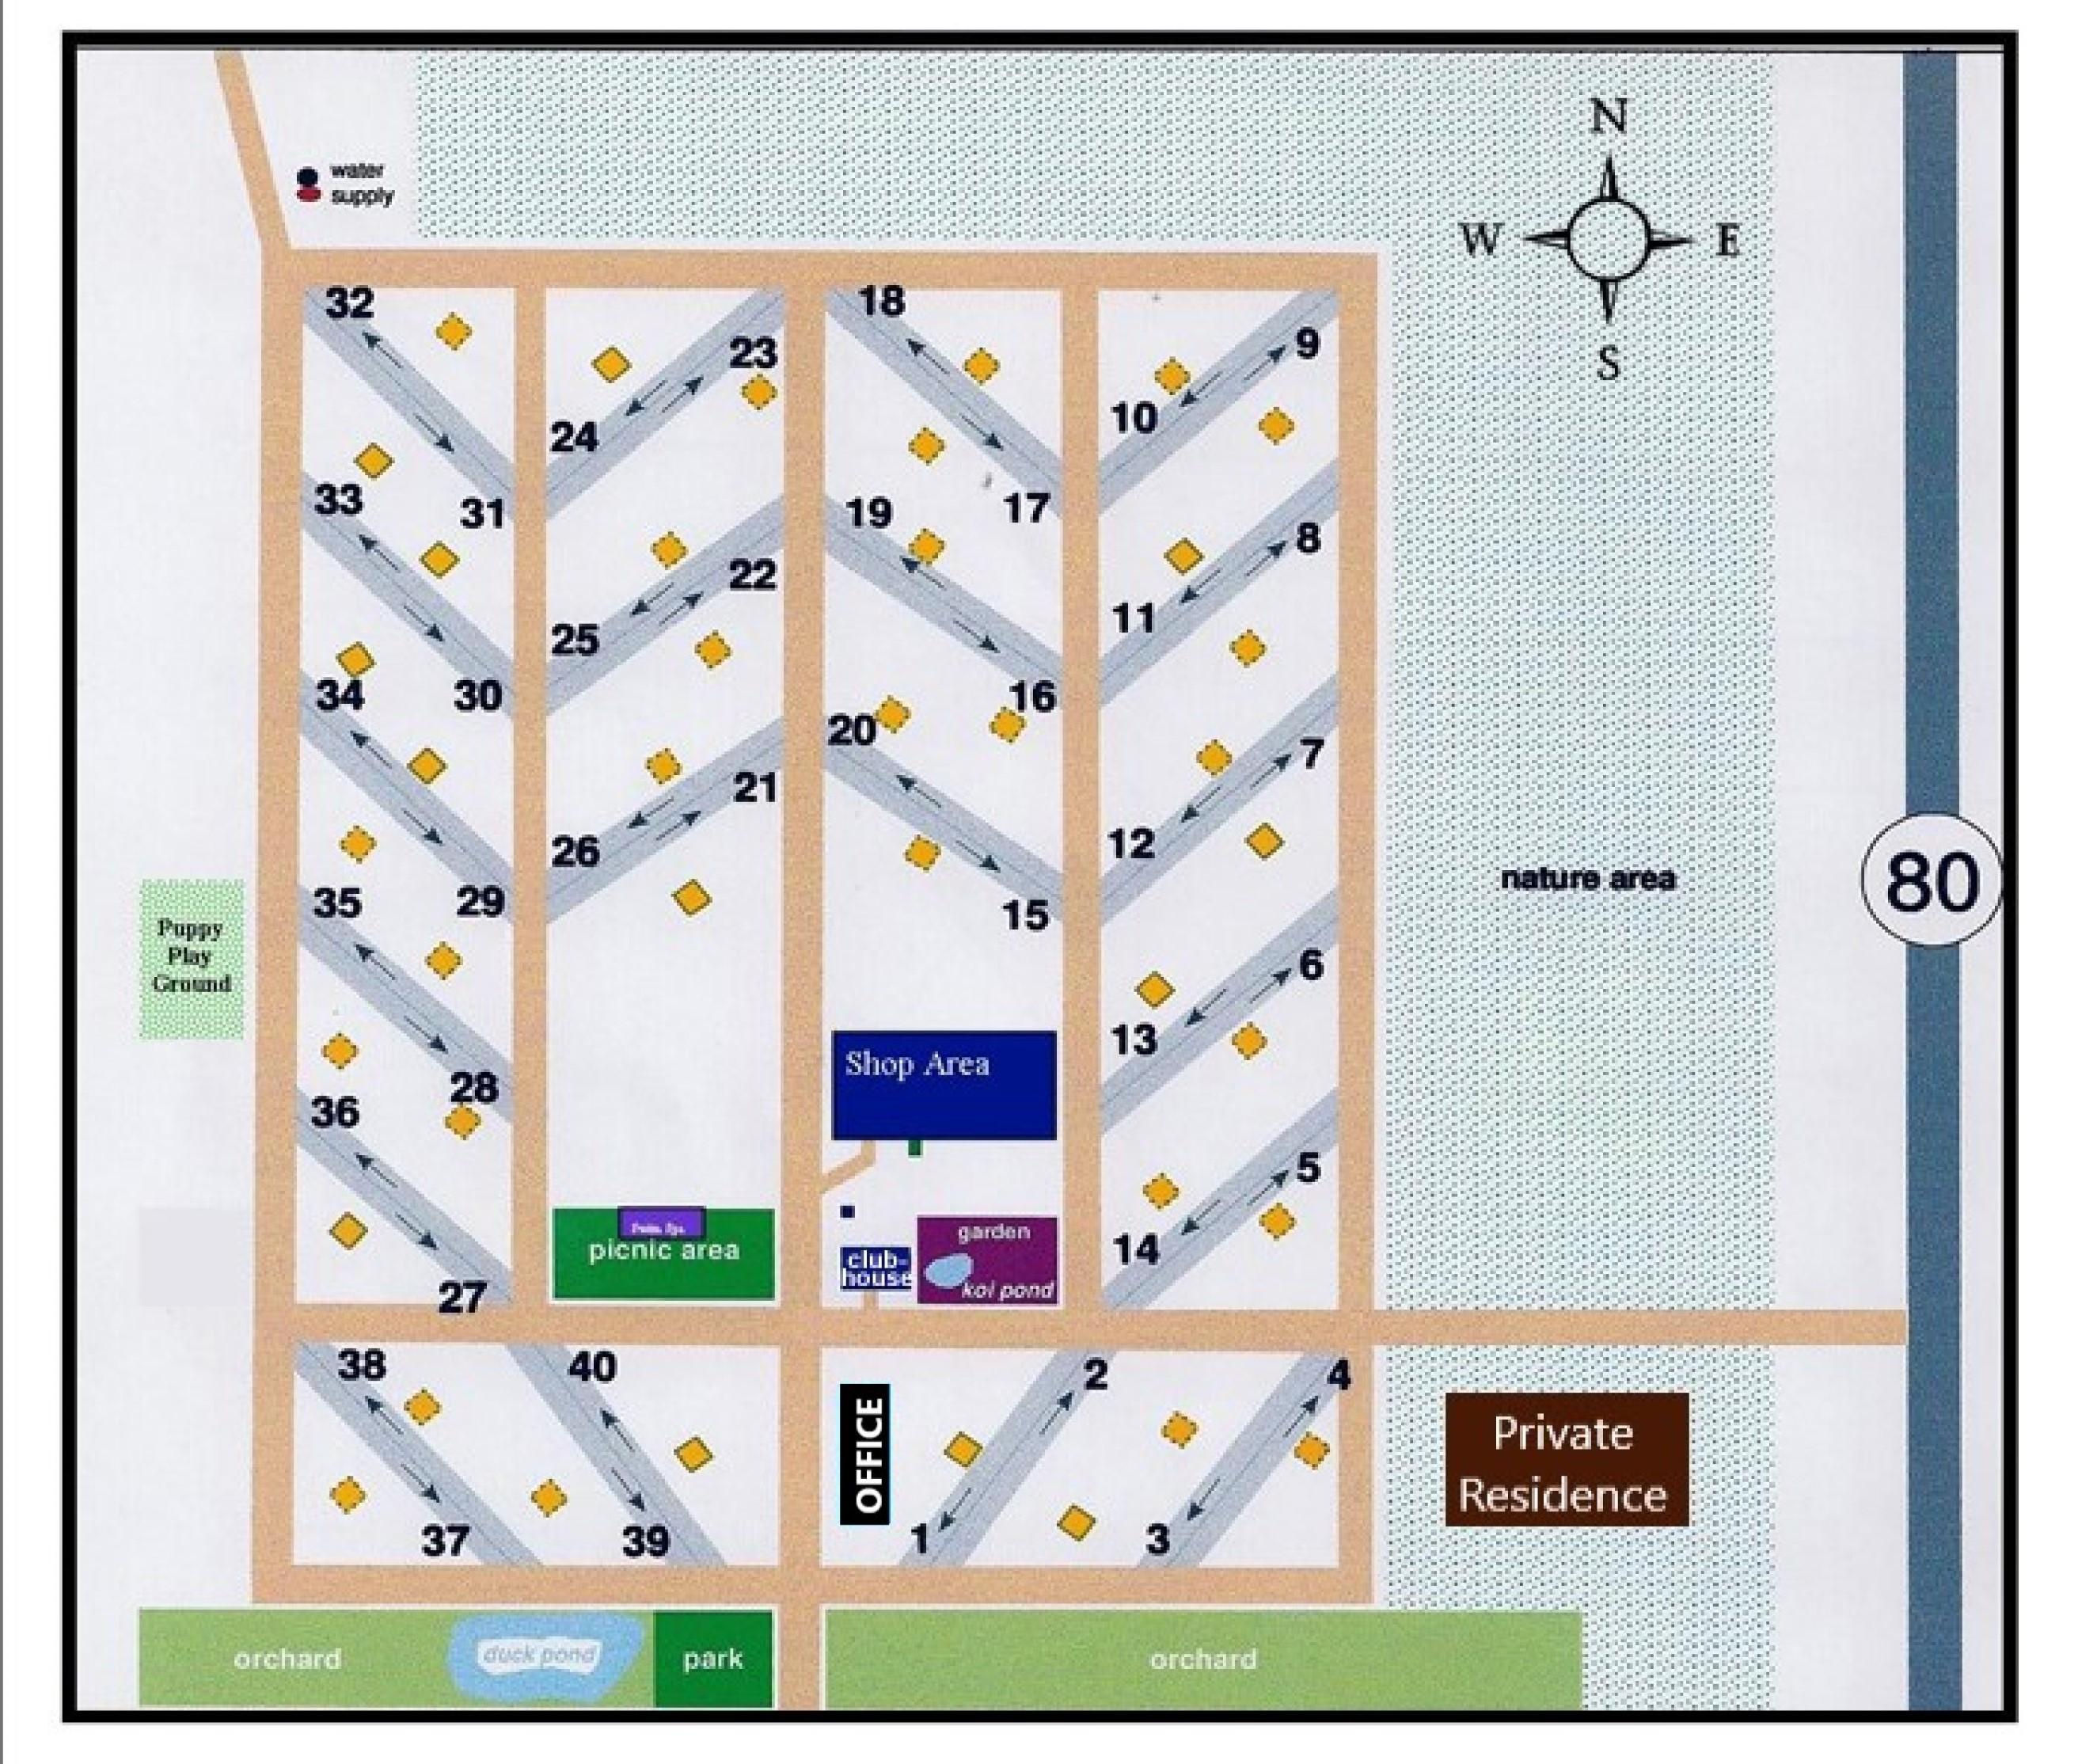 Rusty's RV Ranch Park Map